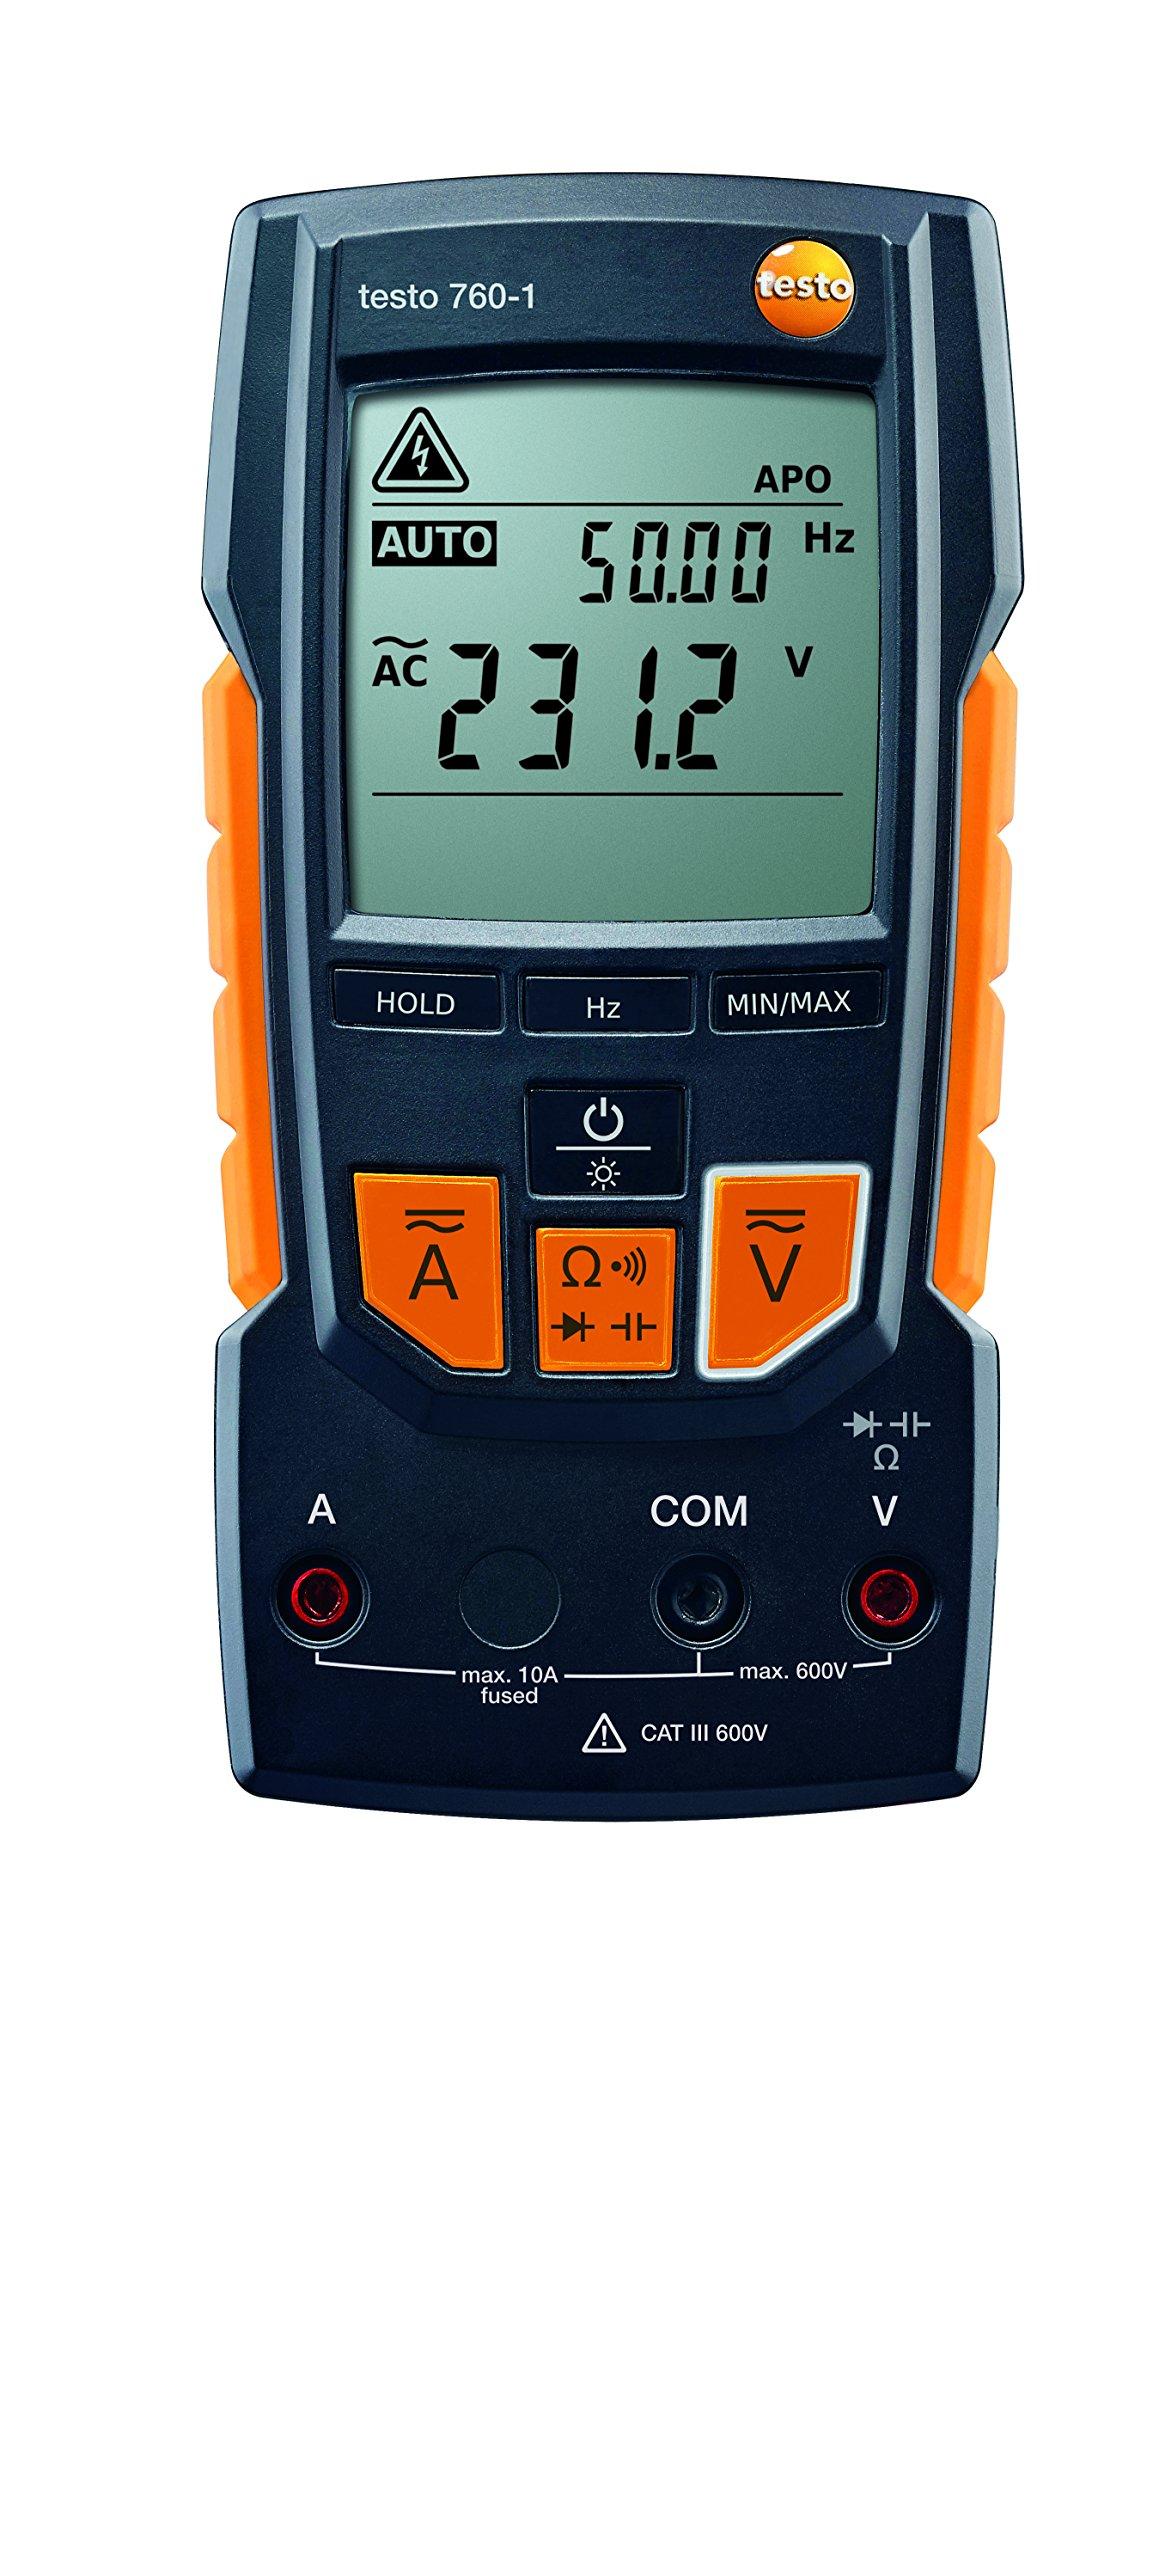 Testo 0590 7601 760-1 Digital Multimeter, 2'' Height, 3'' Width, 7'' Length by Testo (Image #3)